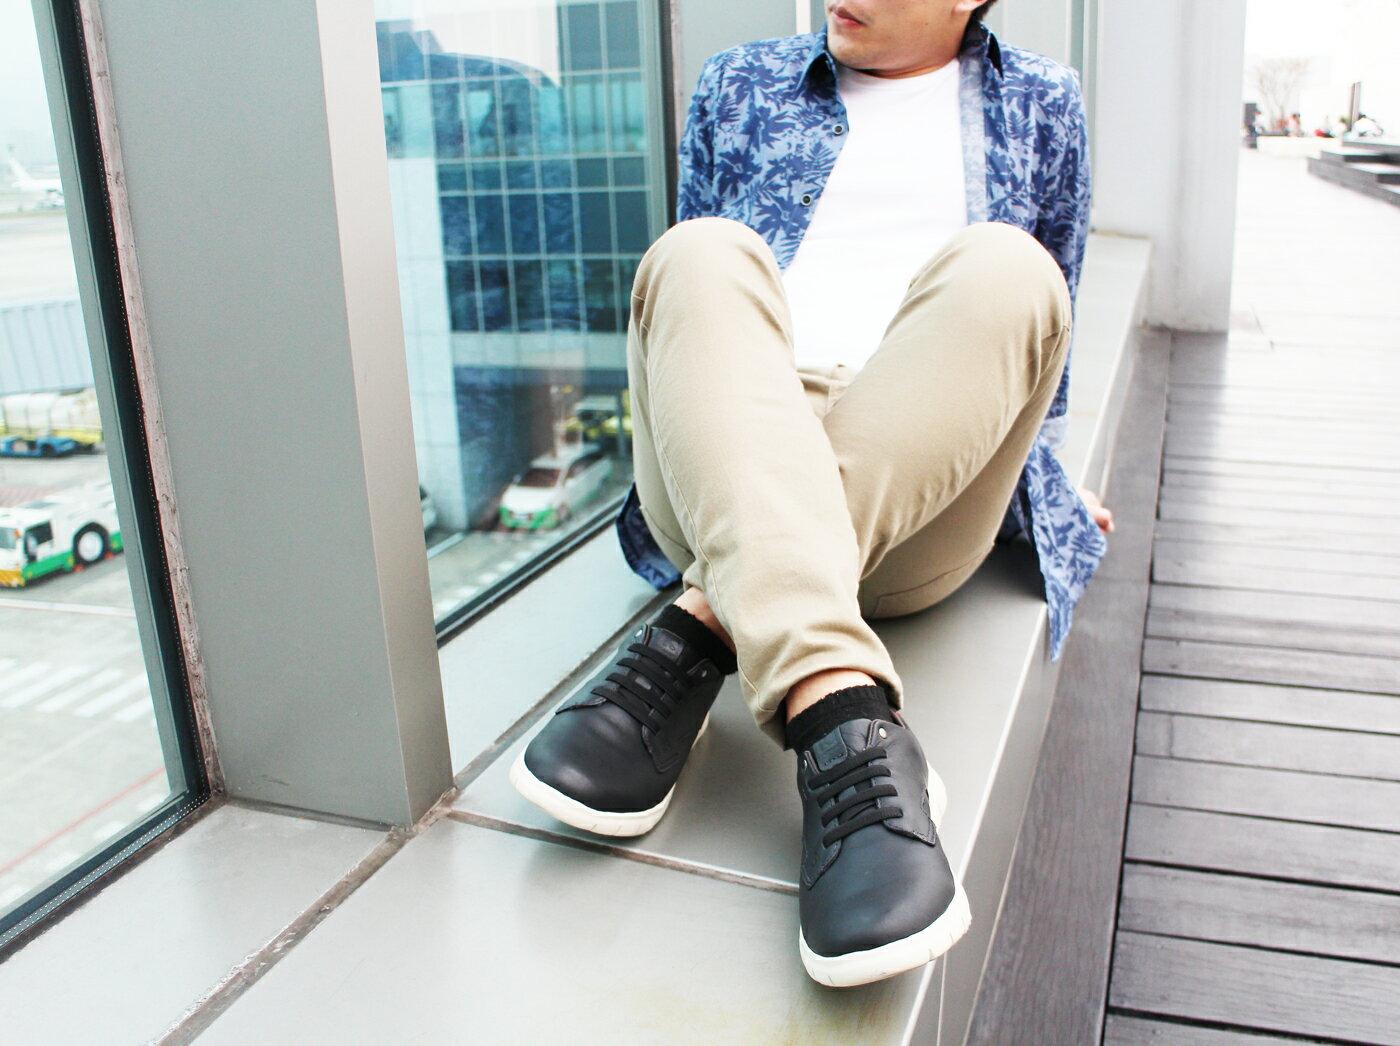 【KILDARE 8折│全店免運】KILDARE綁帶休閒鞋 黑 男 休閒慢跑 2